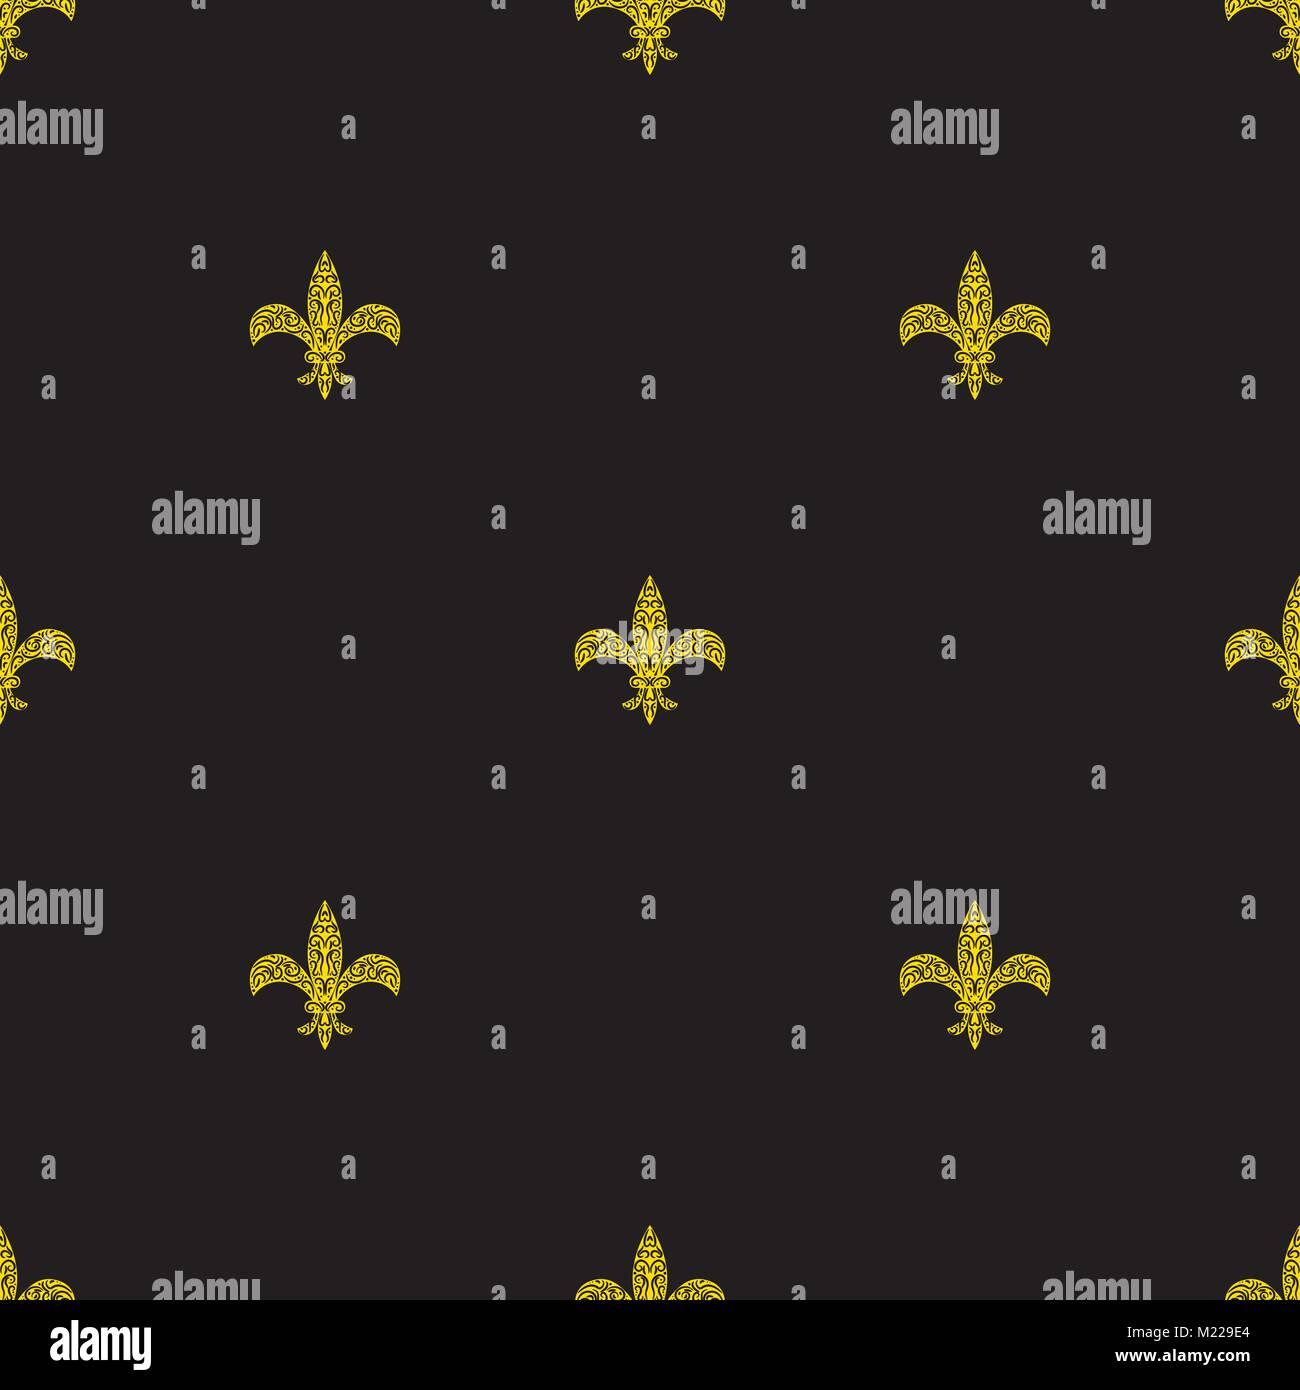 Fleur De Lys Black And Yellow Simple Seamless Pattern Royal Symbol